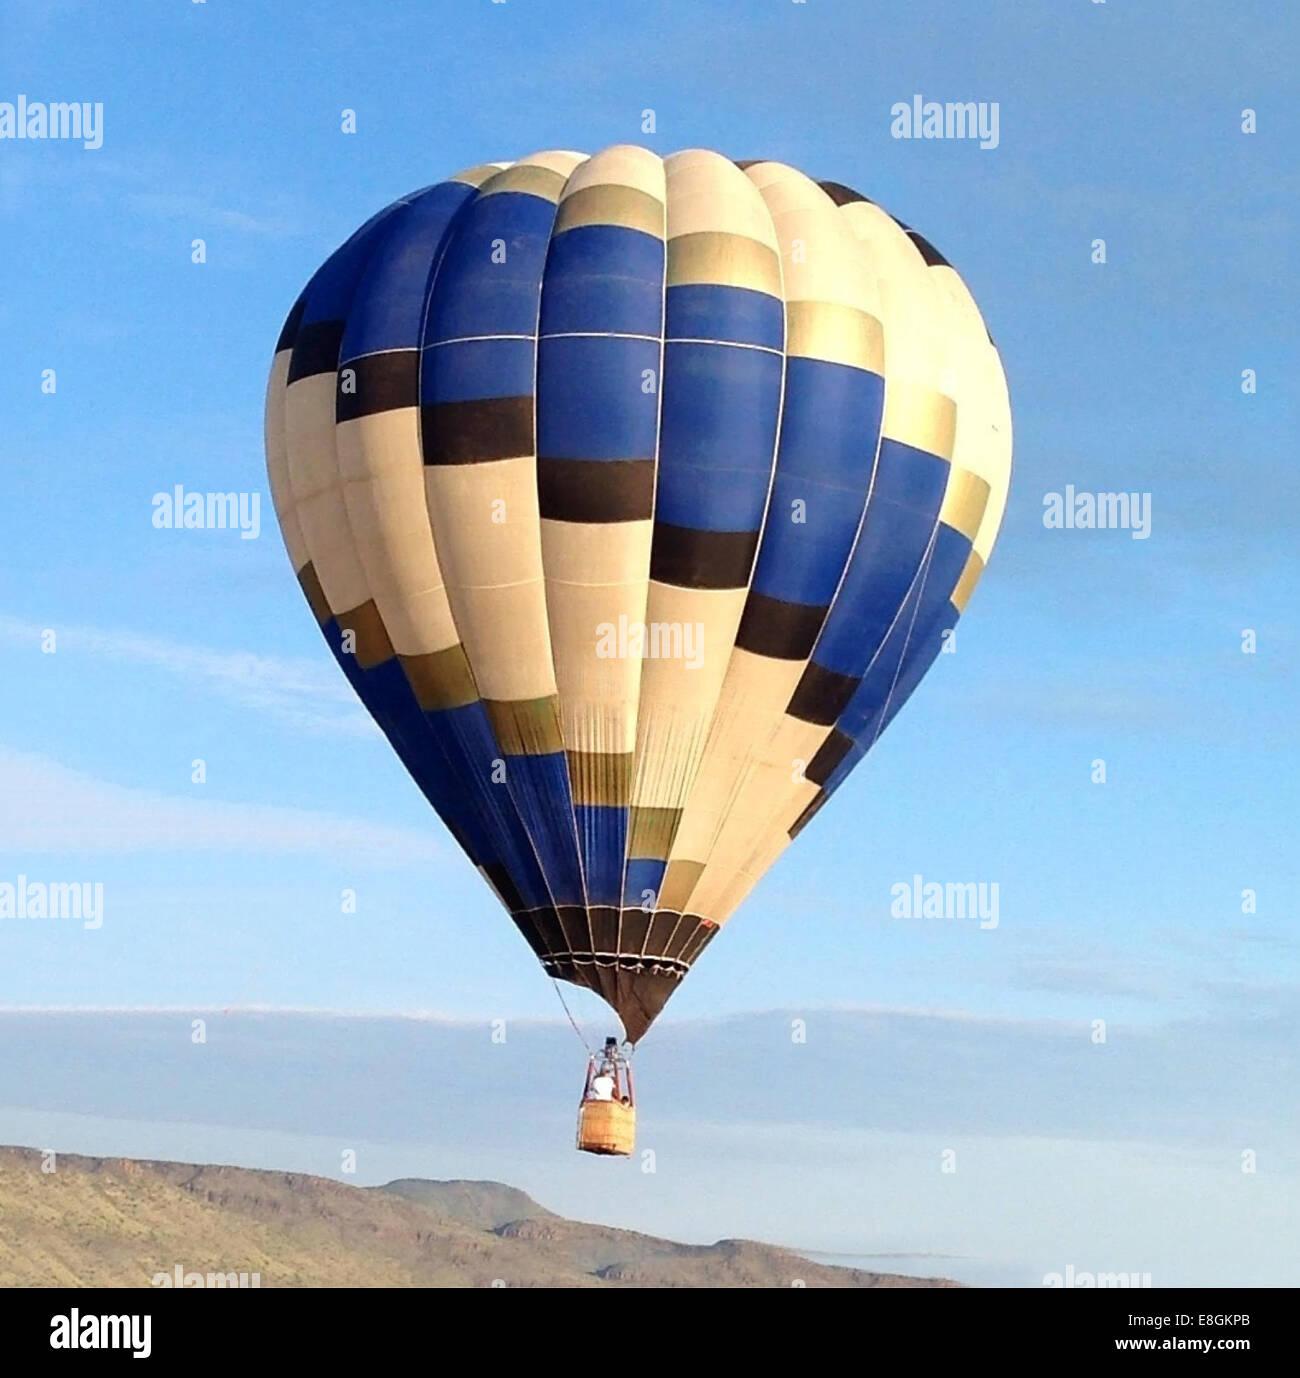 Hot air balloon flying mid air - Stock Image